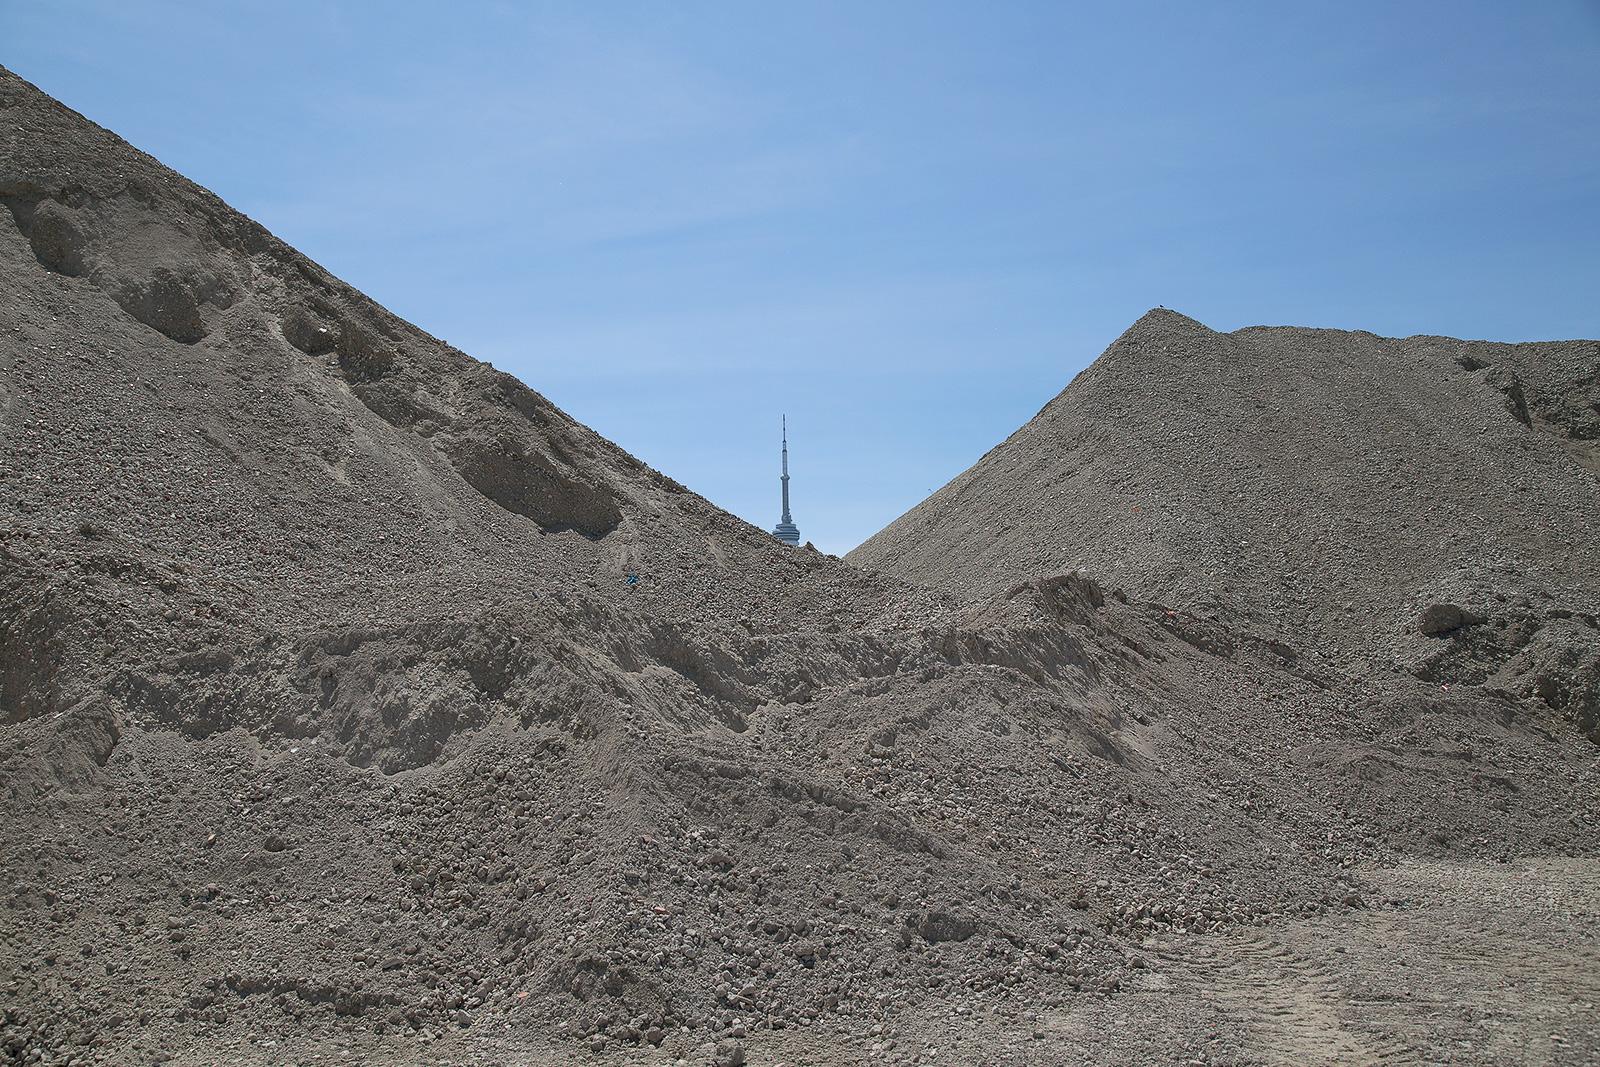 20140615. The sand dunes of Toronto.